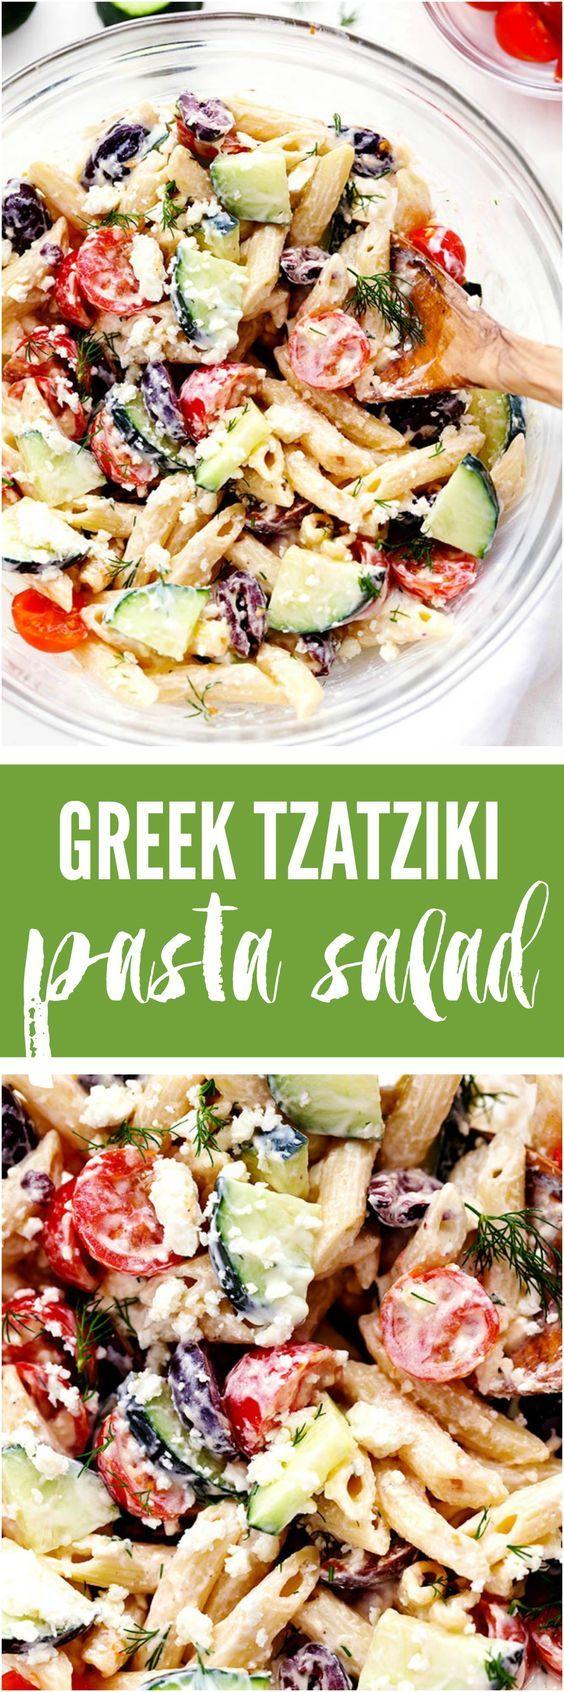 (6) Greek Tzatziki Pasta Salad | Recipe